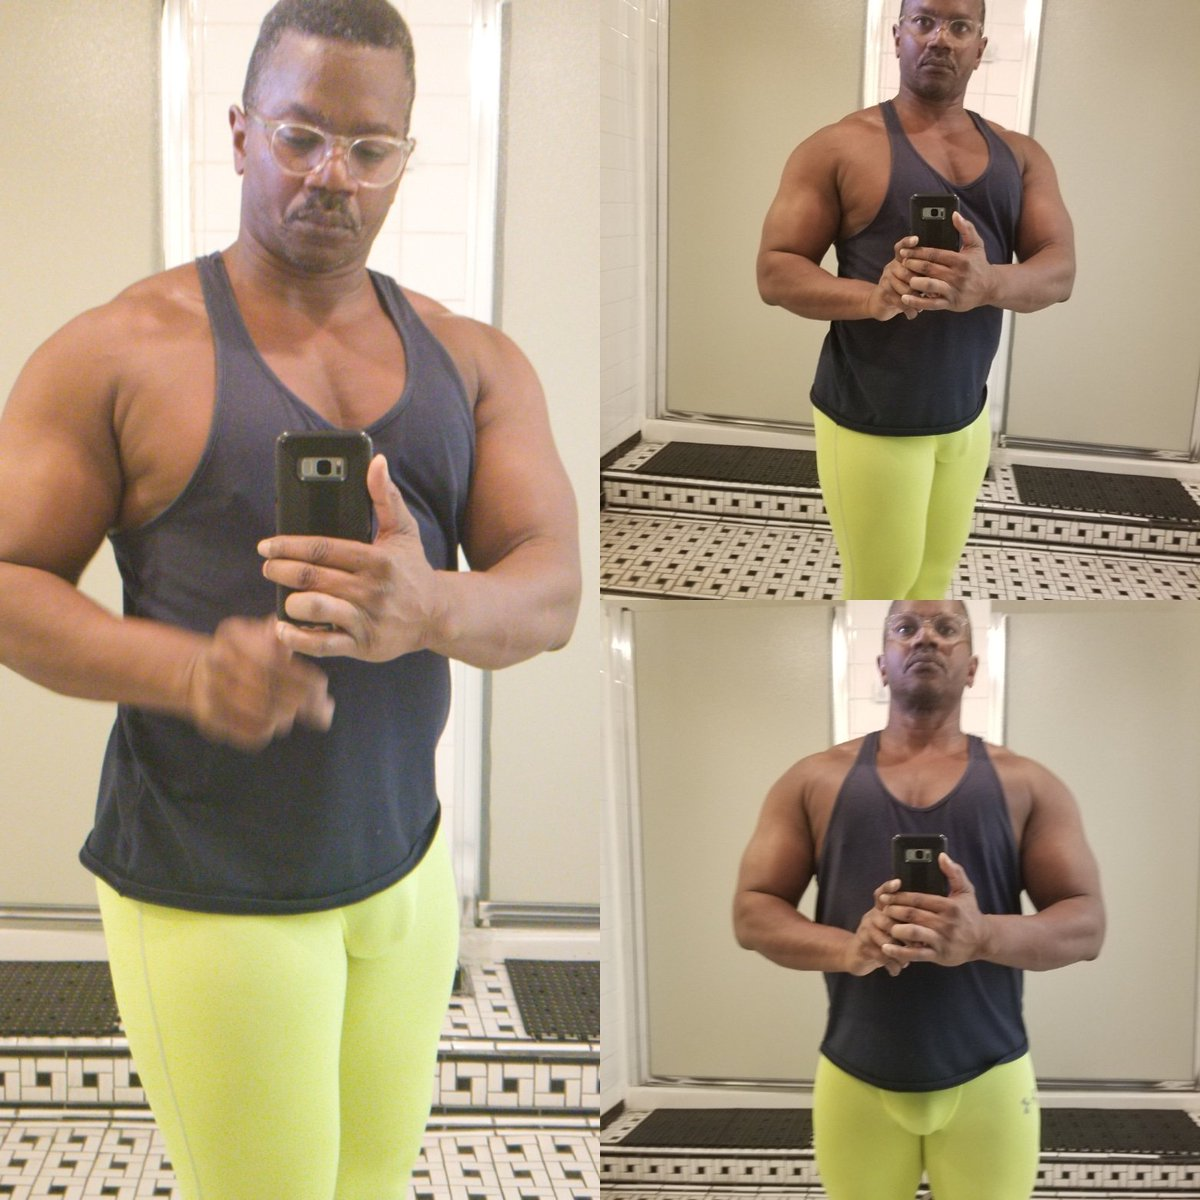 Shoulders coming along.  #muscle  #Bodybuilder  #gear  #spandex  #tights  #gymrat  #bodybuilding  #traps  #shoulders  #delts